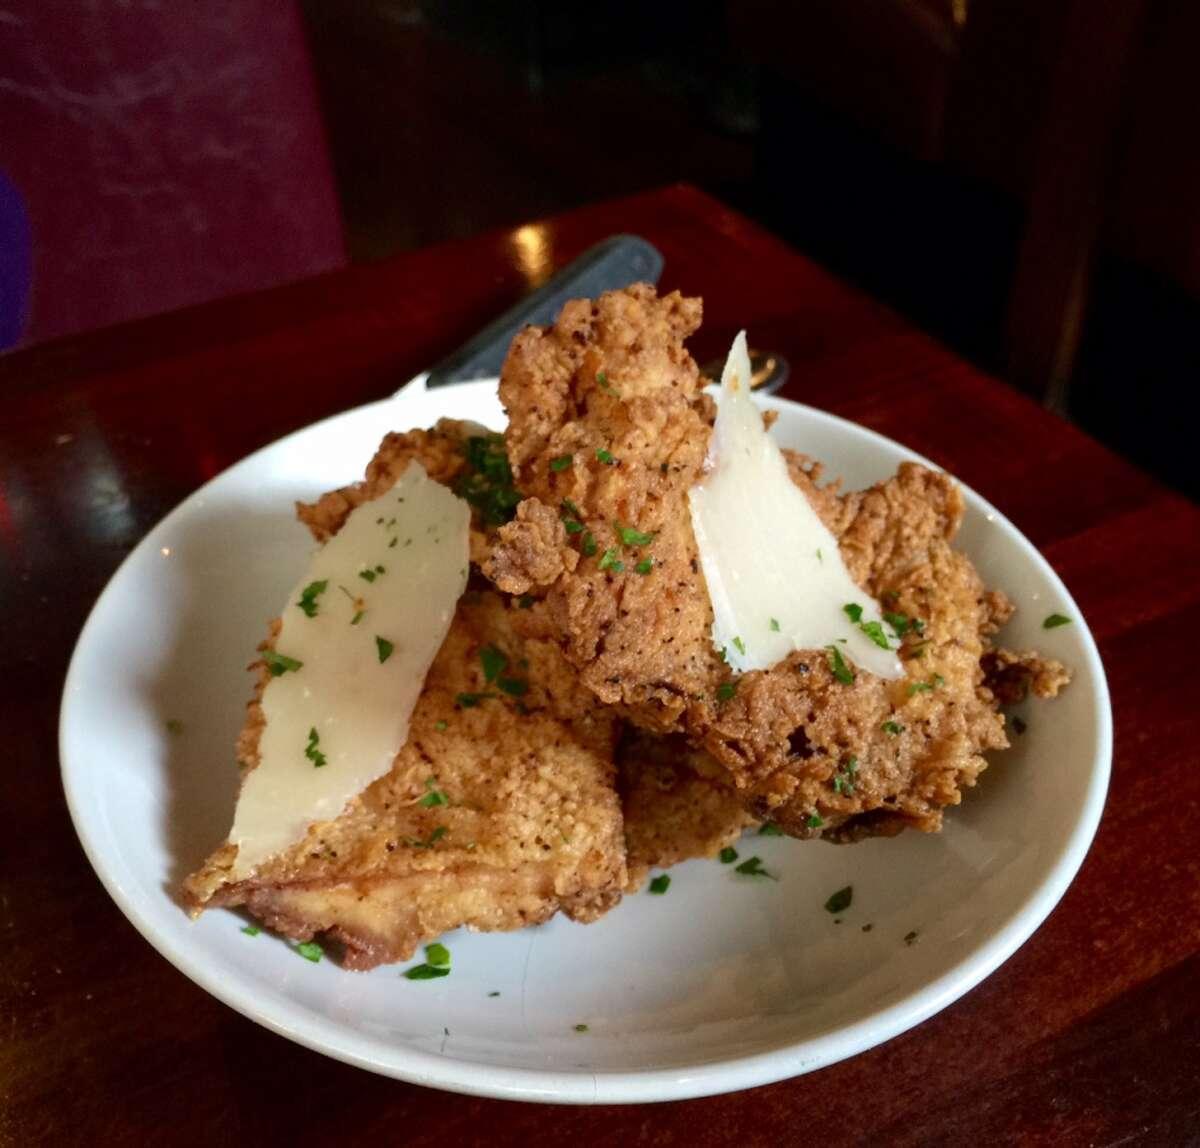 Fried chicken thighs ($13.95)